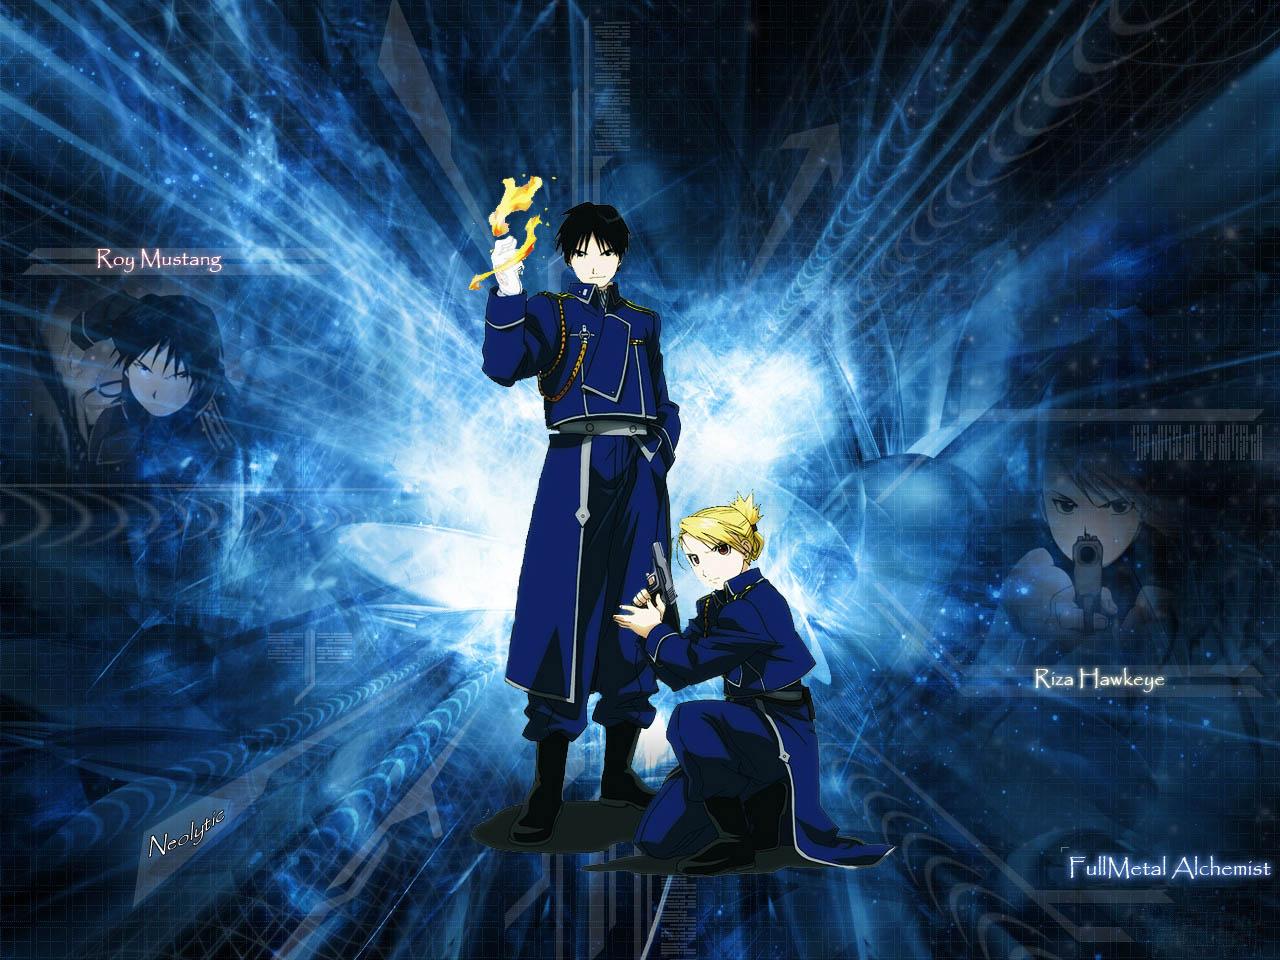 Fullmetal Alchemist Brotherhood - Mustang and Hawkeye